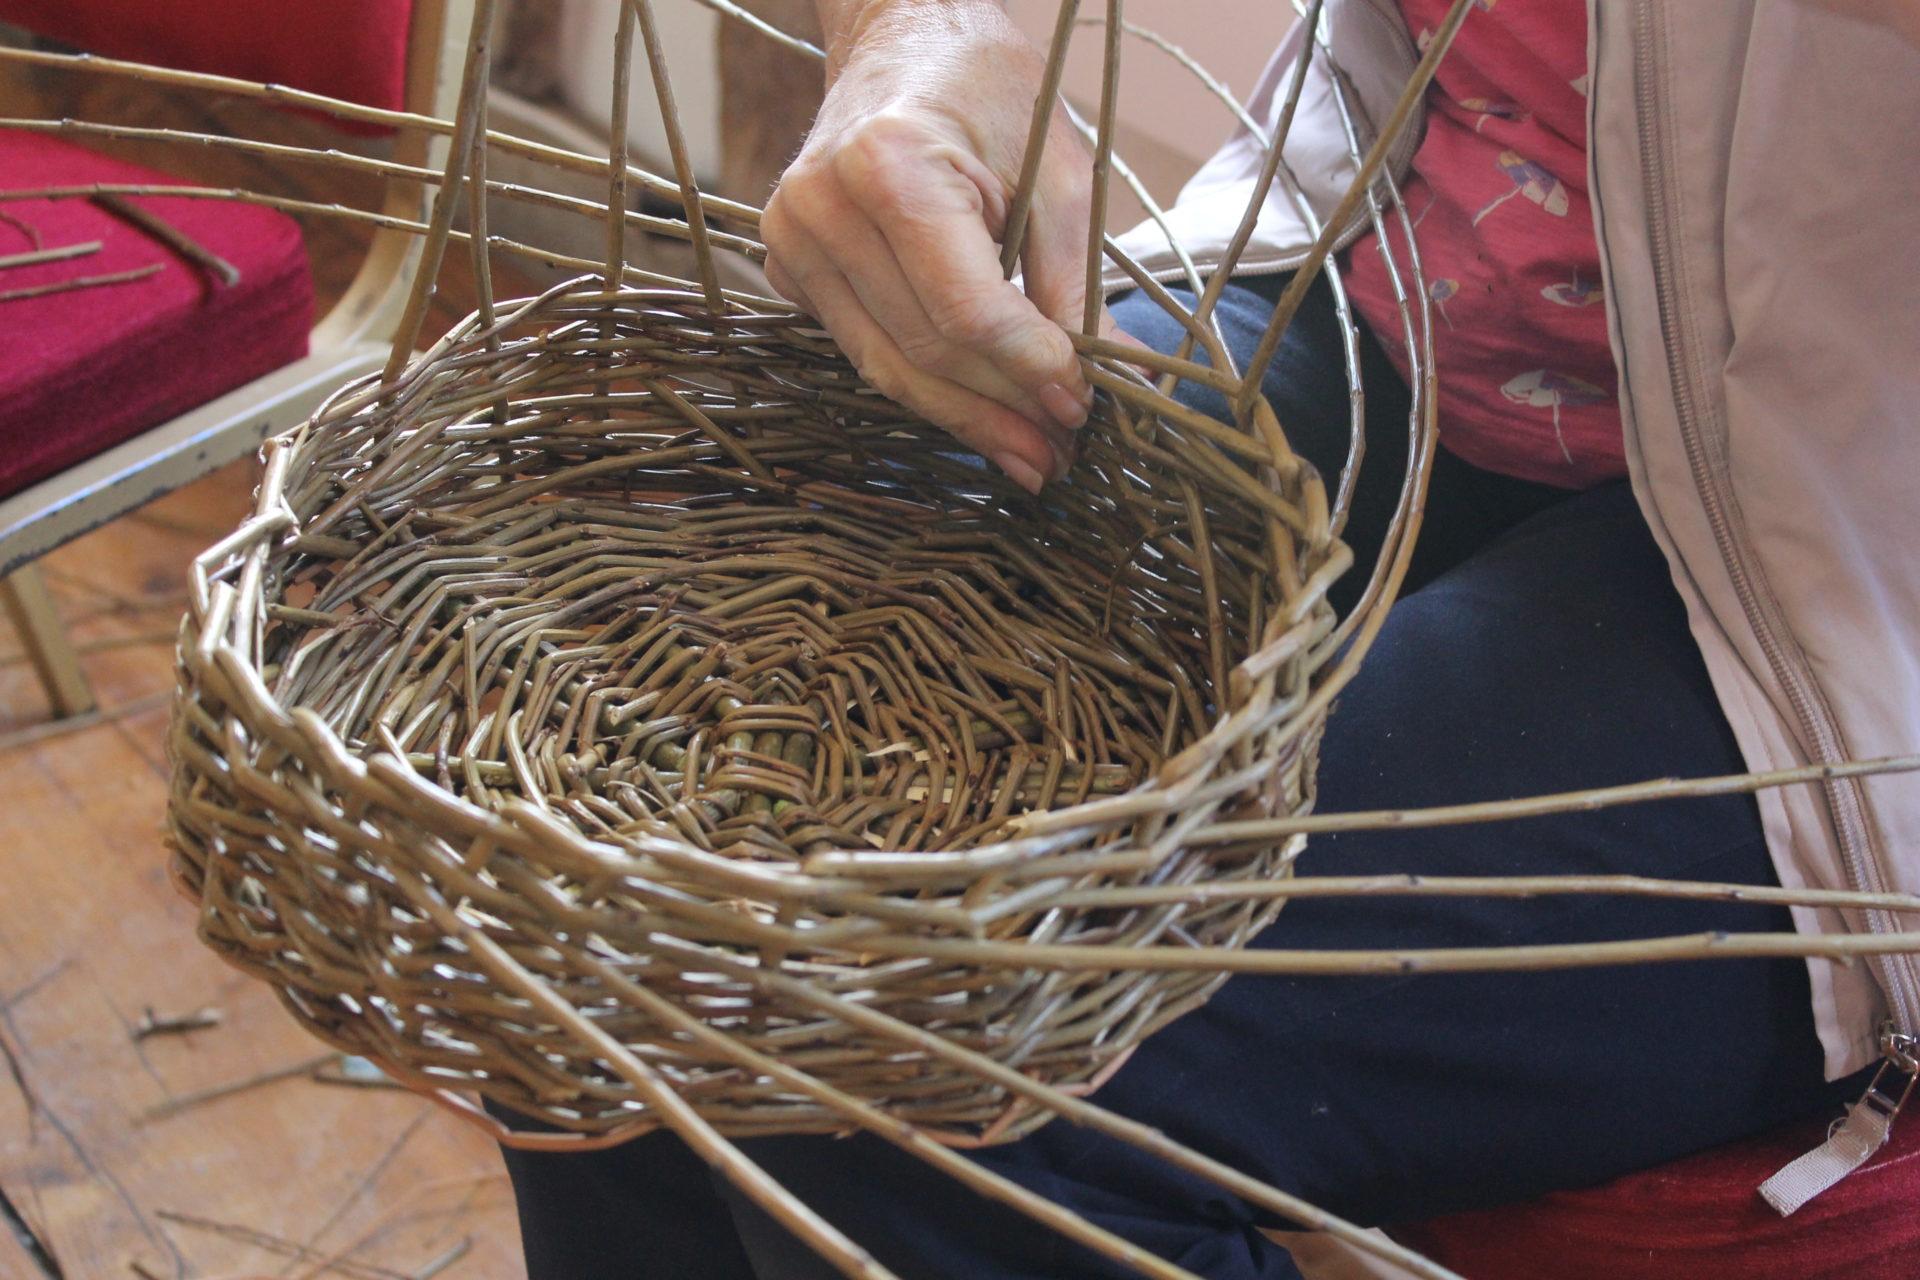 Basket Weaving June 2020 – Morning